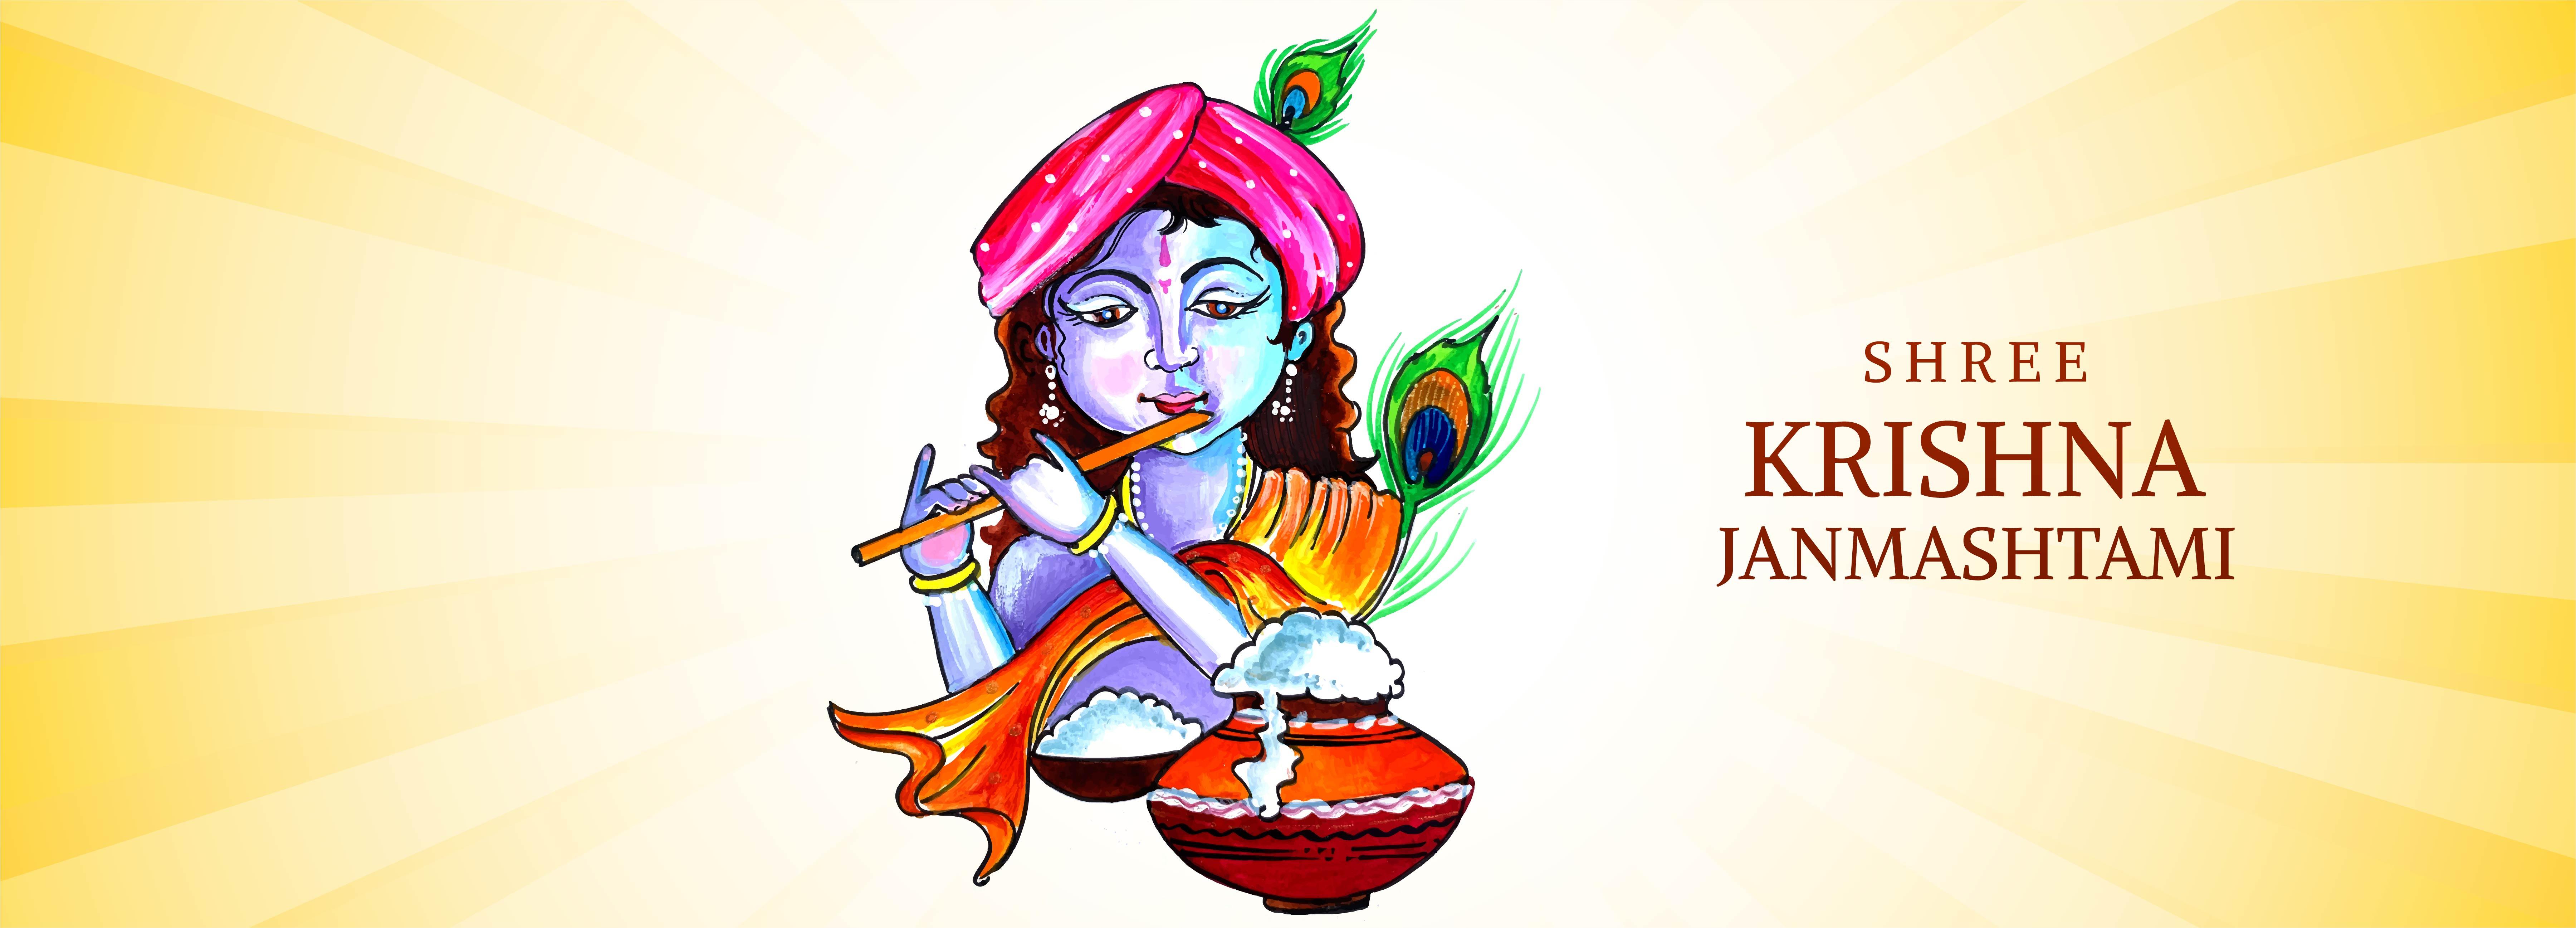 señor krishna tocando la flauta con fajín naranja janmashtami diseño de banner